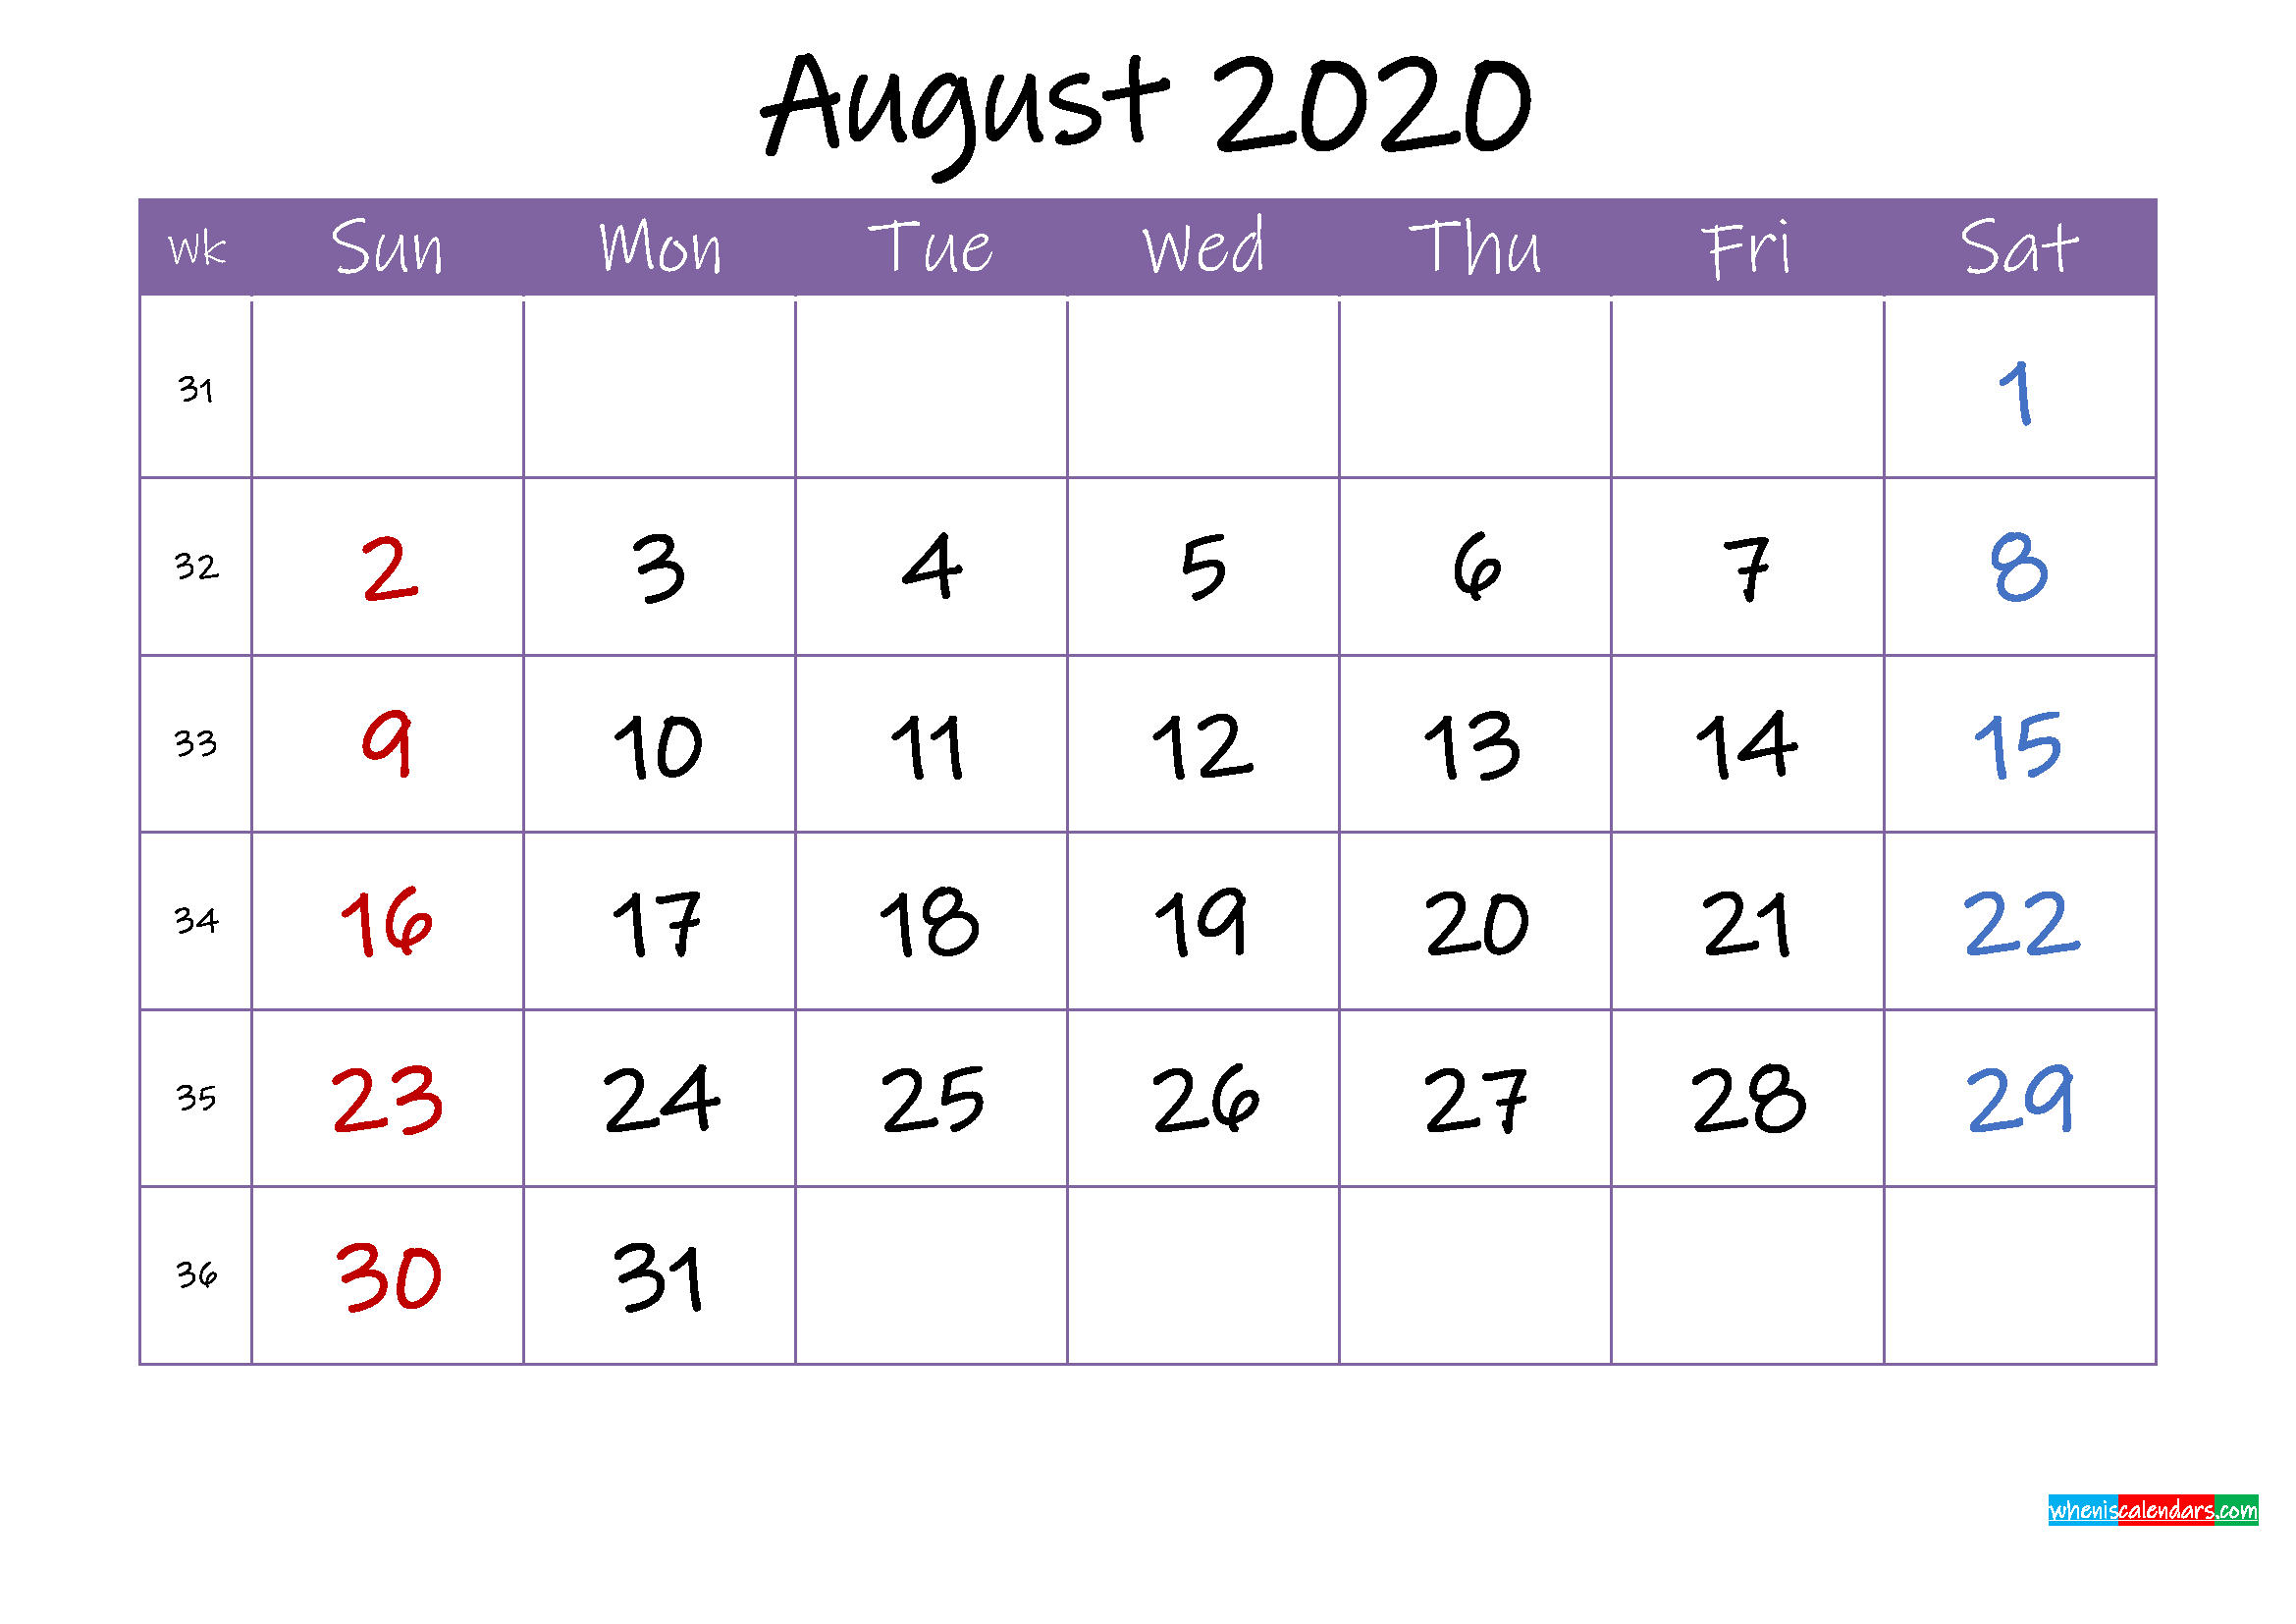 August 2020 Calendar with Holidays Printable